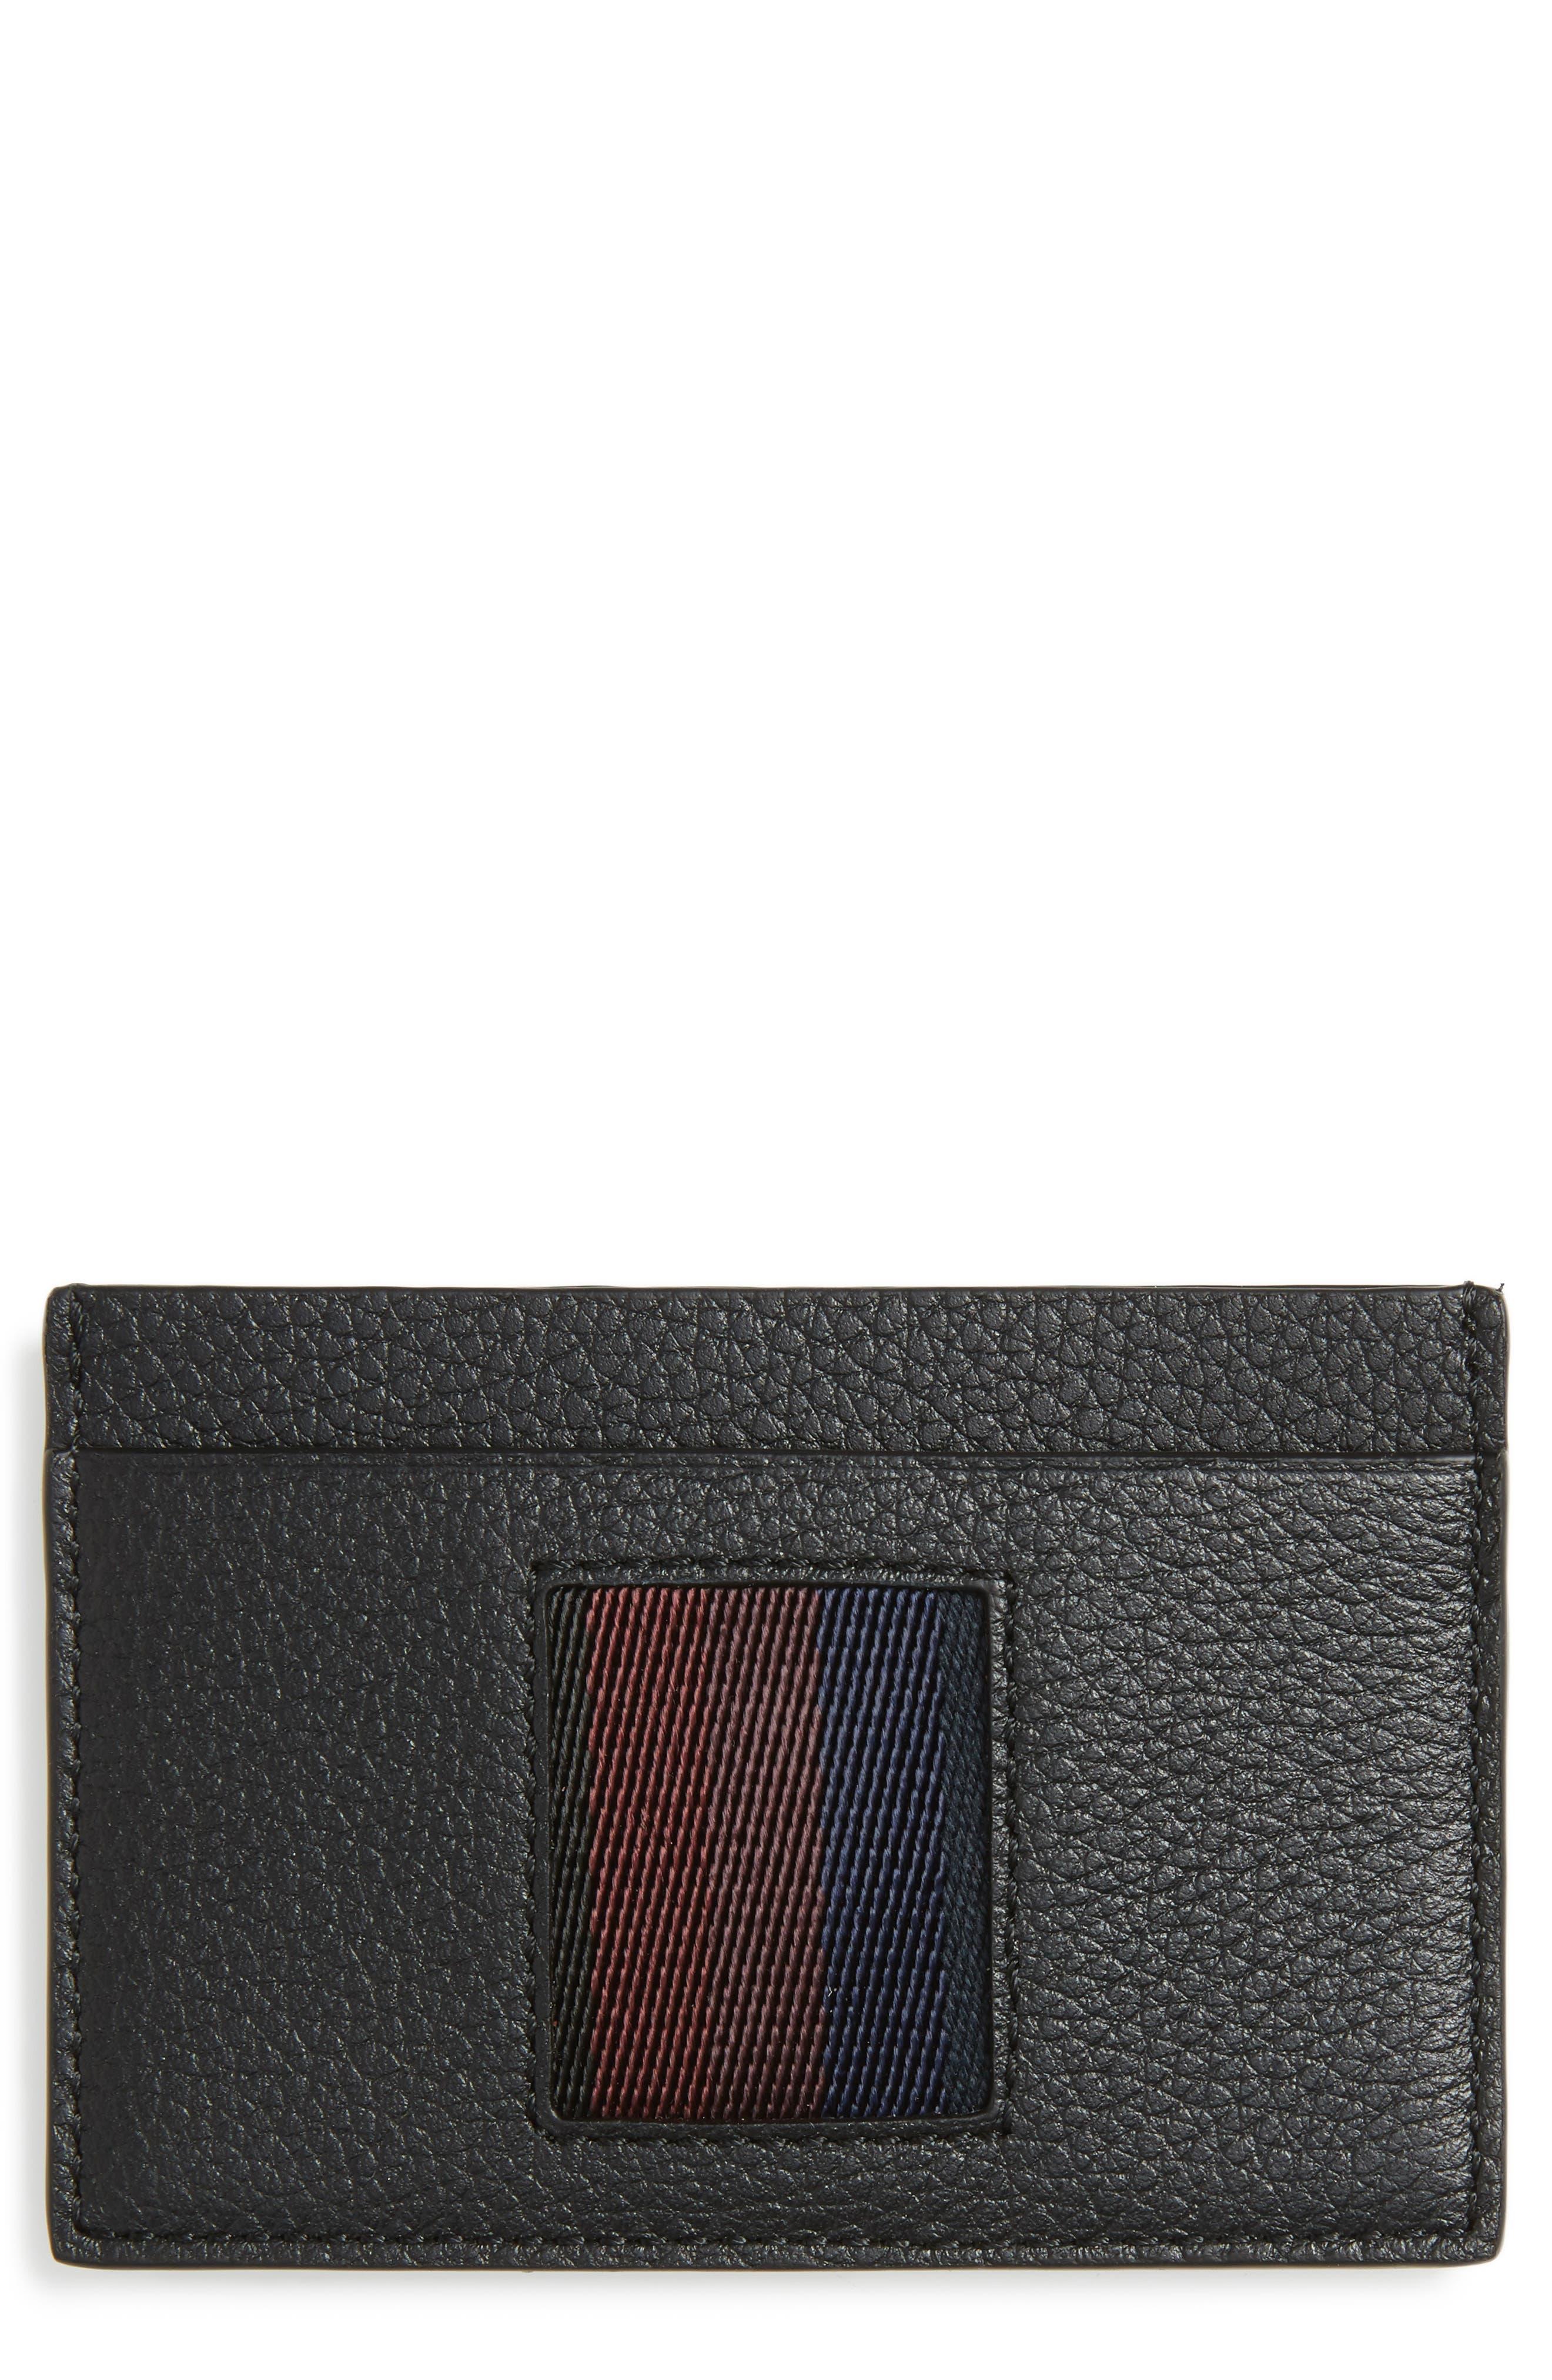 Stripe Webbing Leather Card Case,                         Main,                         color, Black